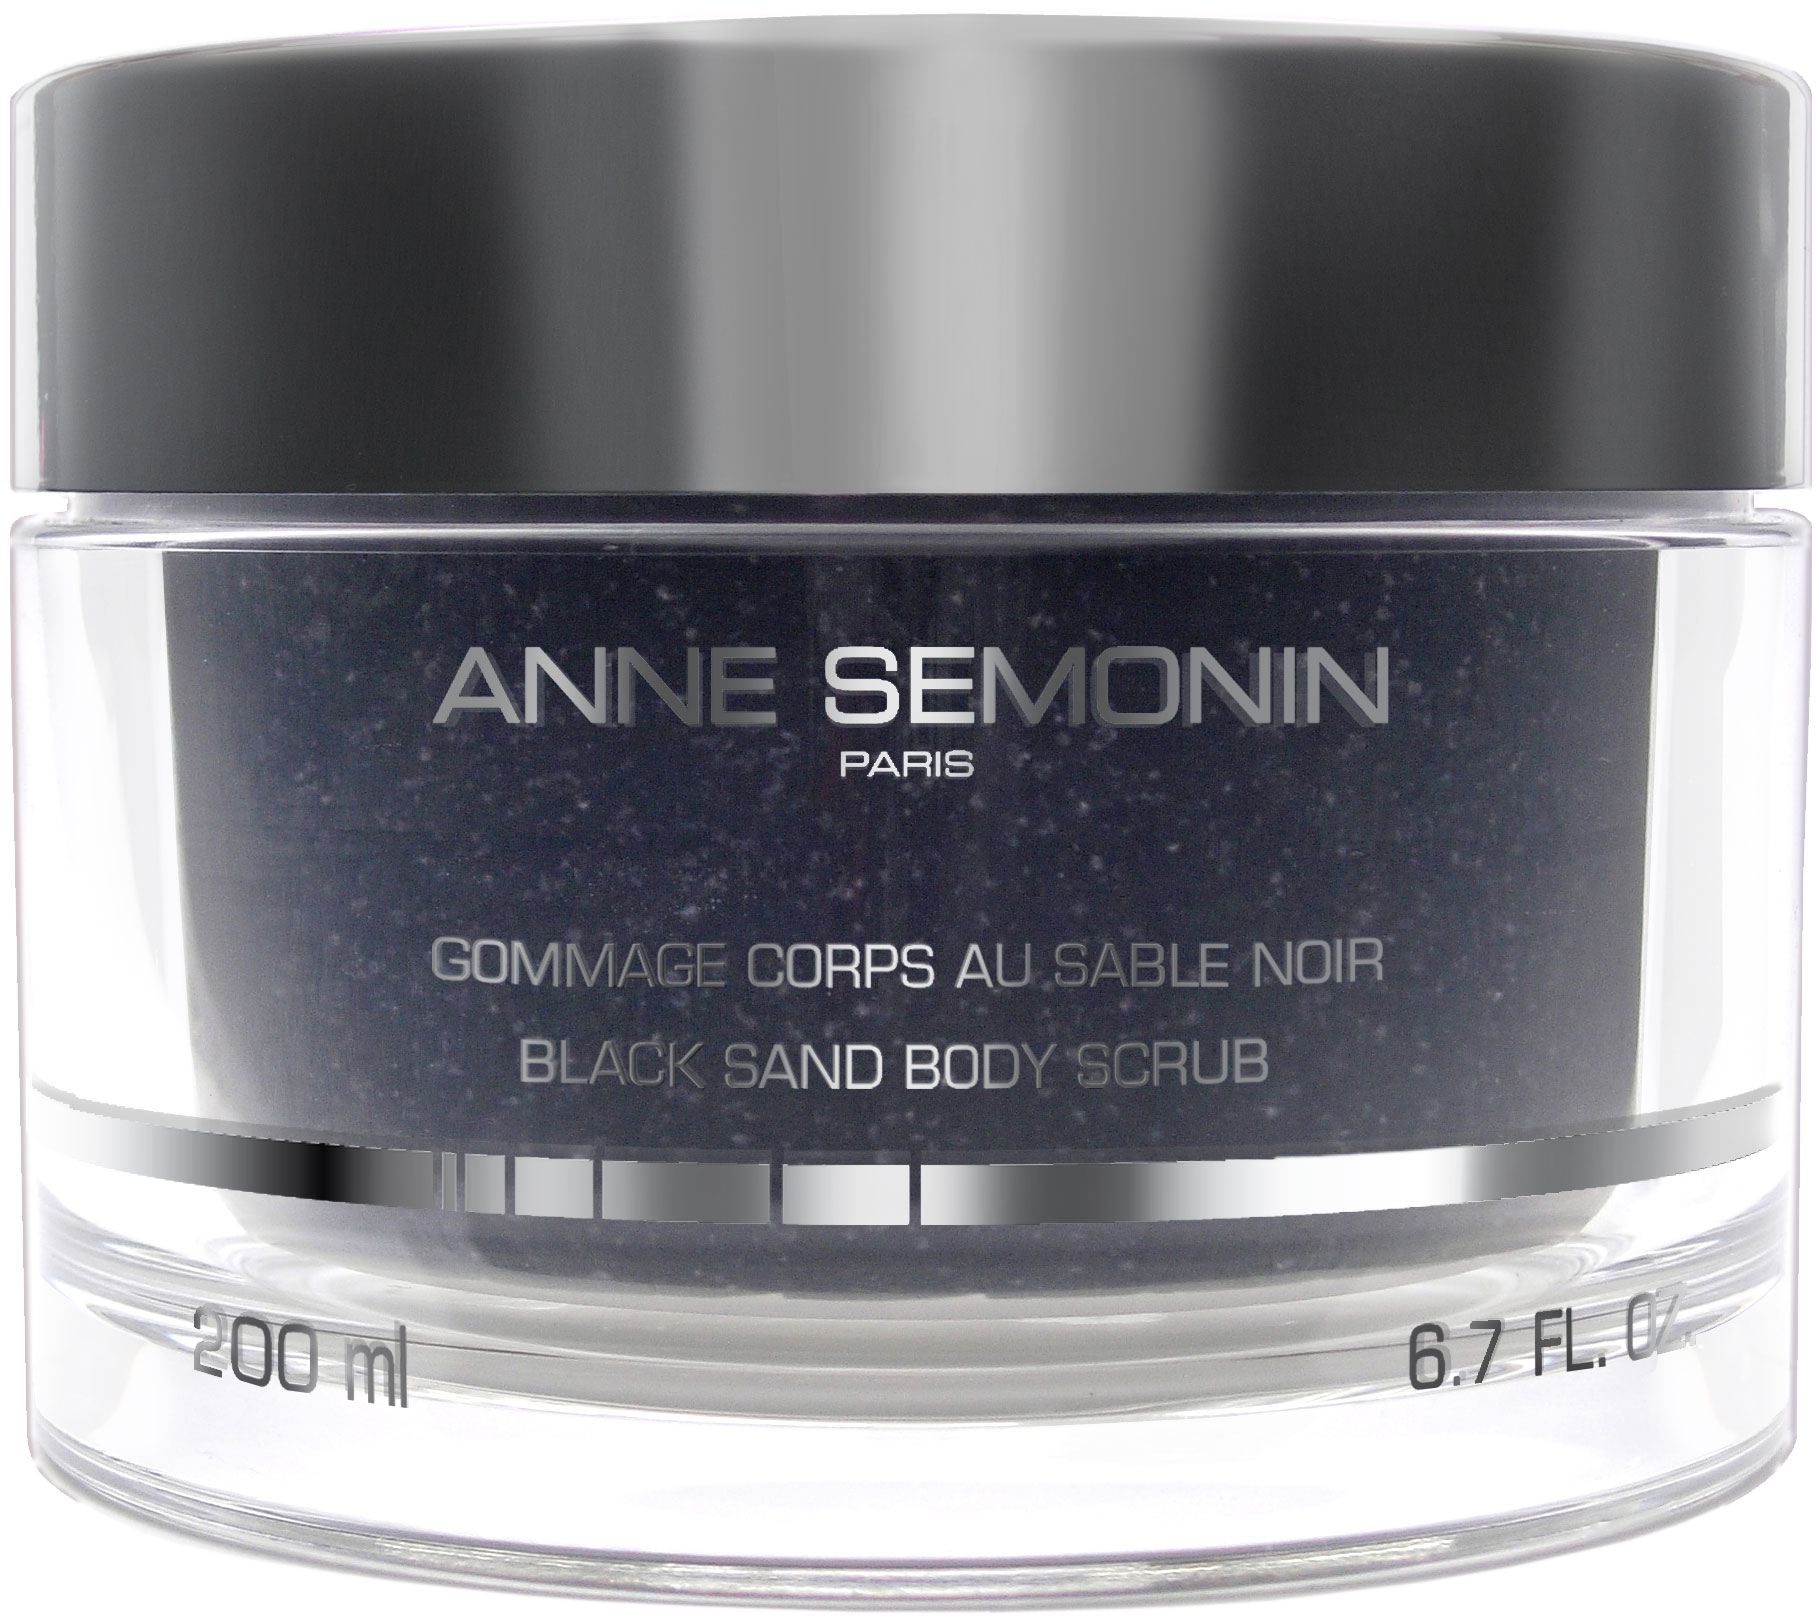 Anne Semonin black sand exfoliator